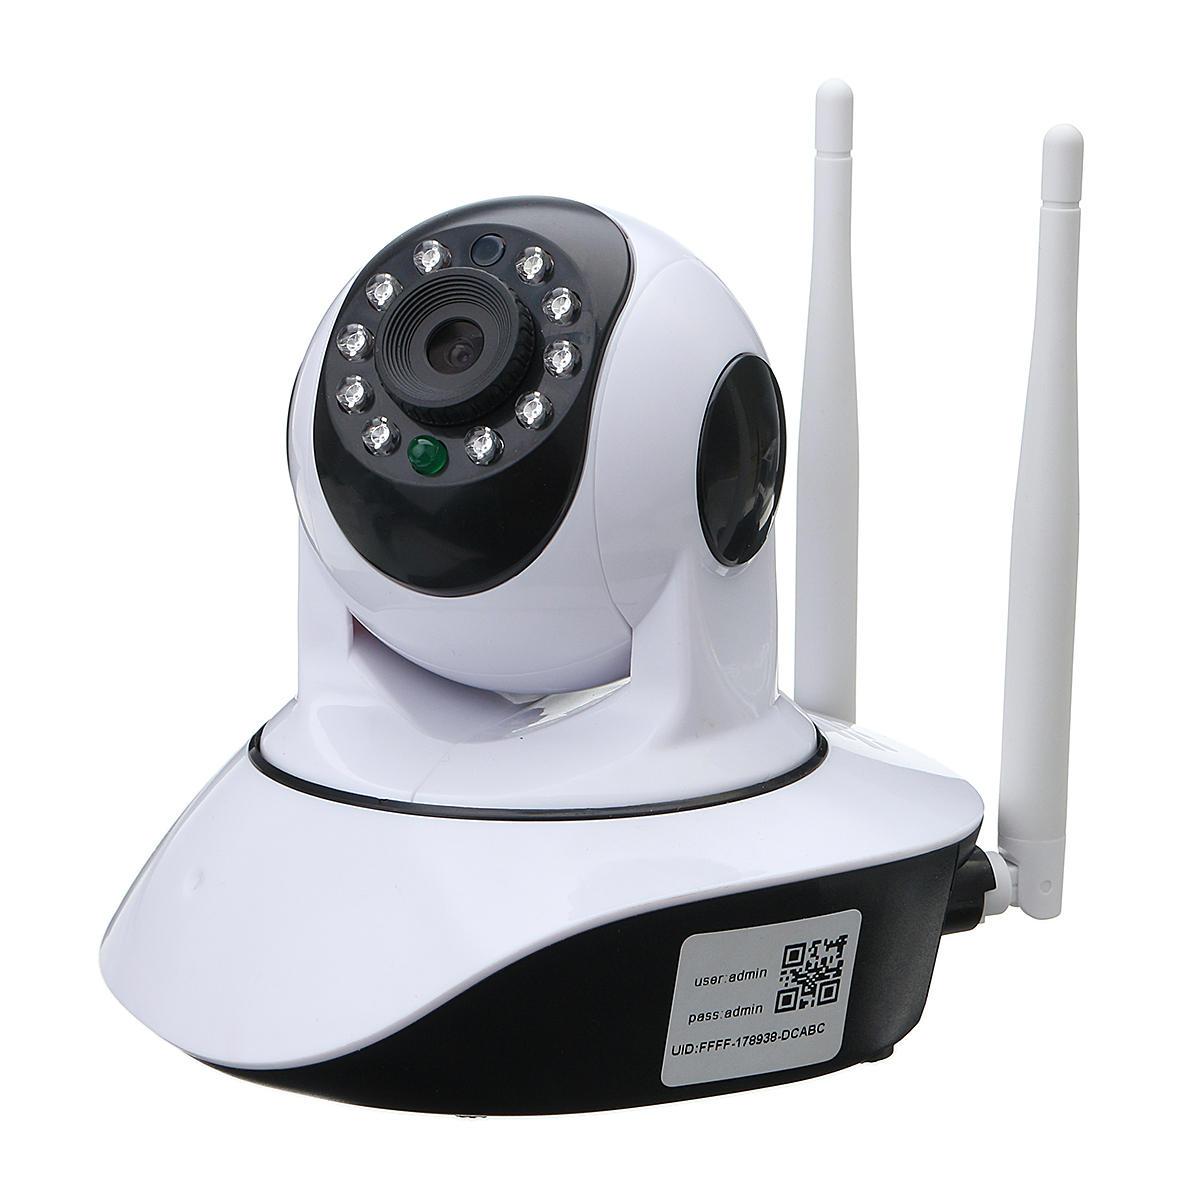 720P Bezprzewodowa kamera IP Sieć bezpieczeństwa Kamera CCTV Pan Tilt Night Vision Kamera internetowa WIFI